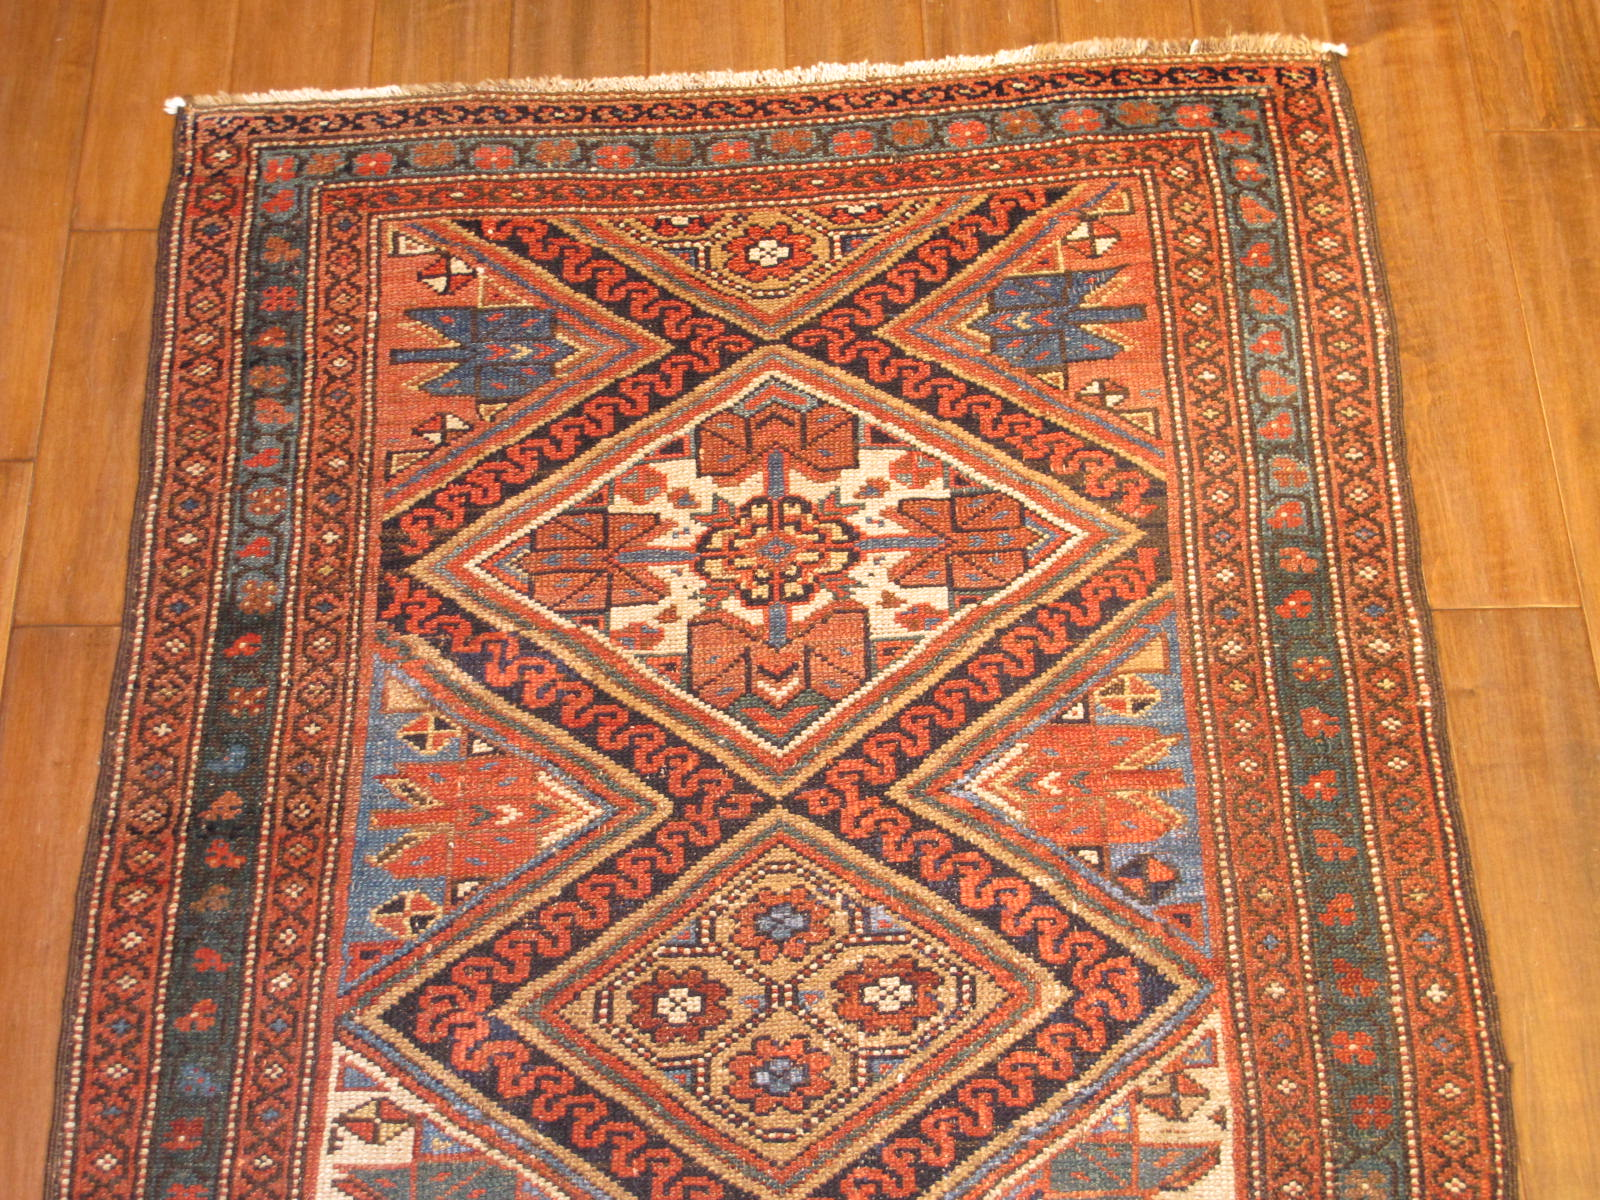 23205 antique persian kurdish runner 3,5 x 16,3 (2)